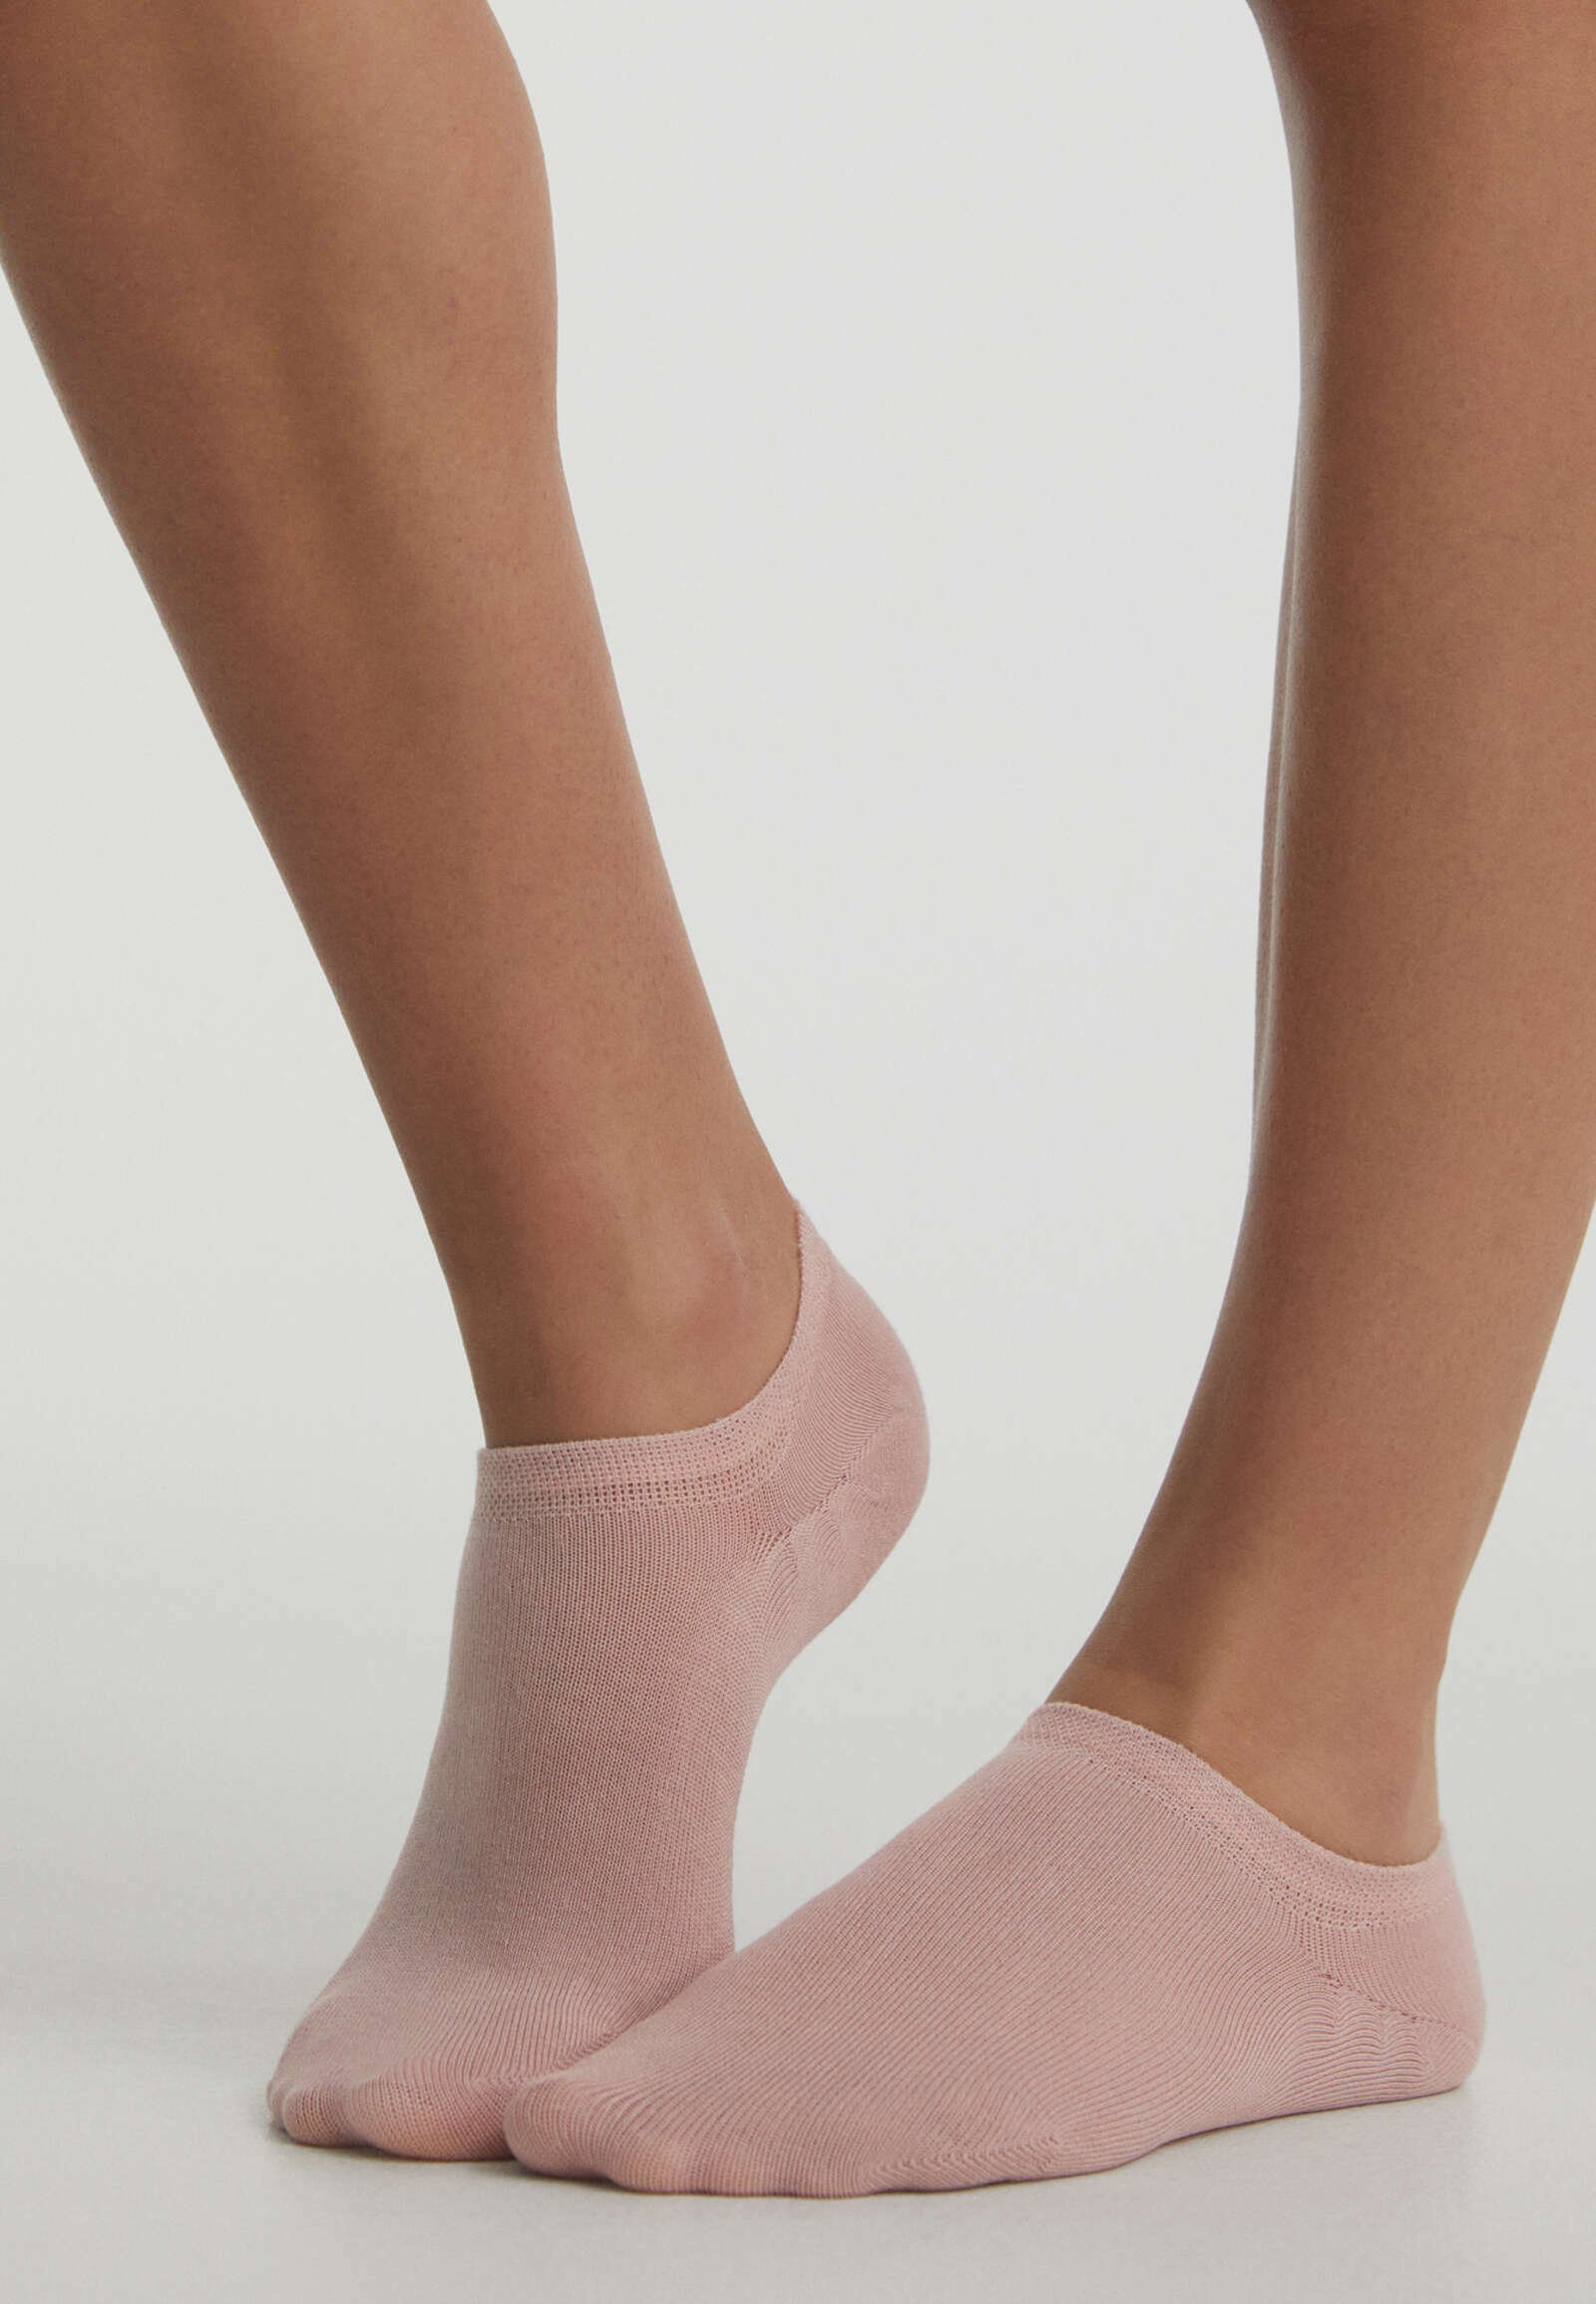 Femme 2 PACK - Socquettes